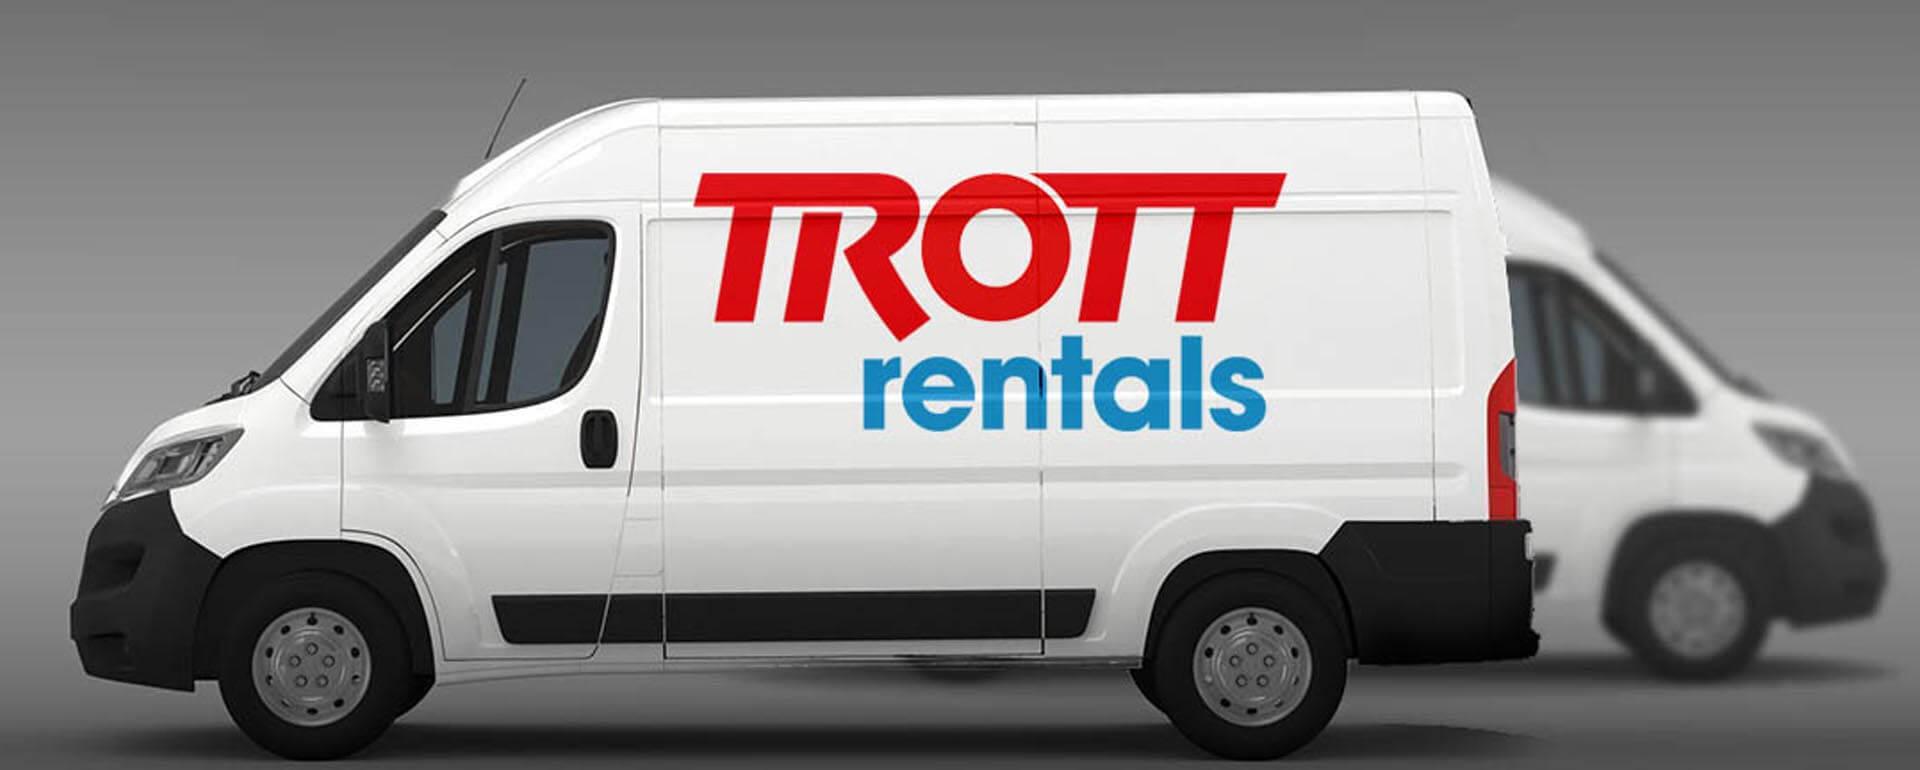 Trott Rental New Logo Design